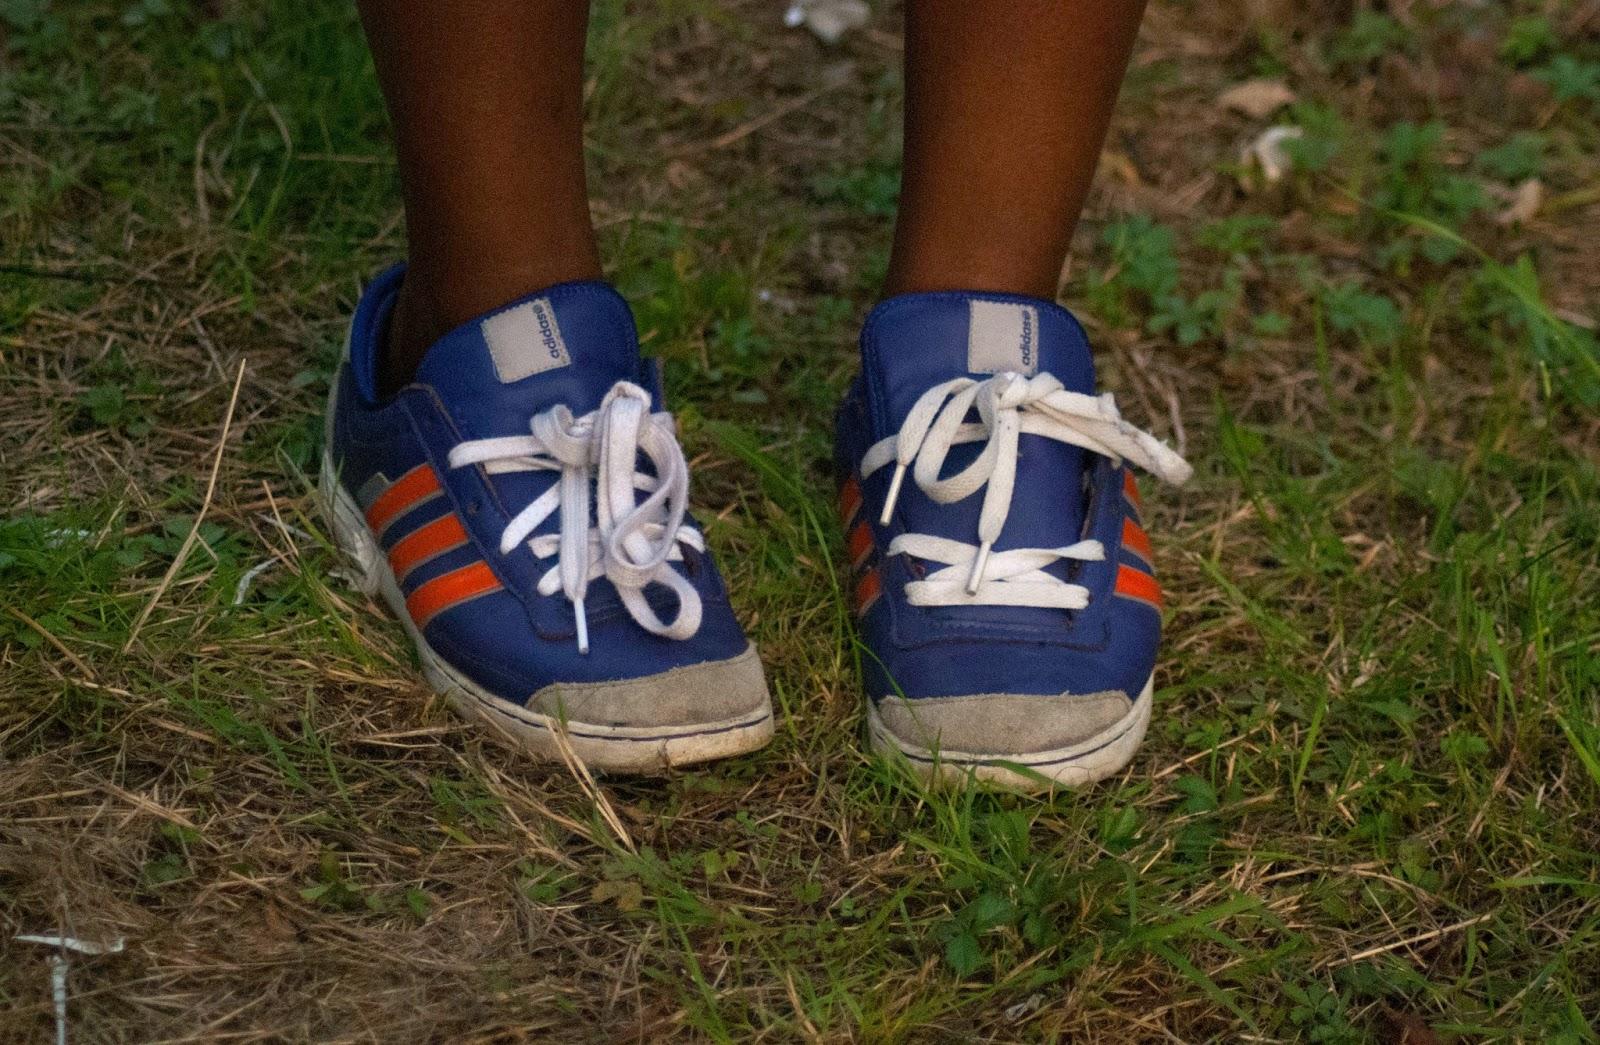 Adidas Orange and Purple Trainers - 100 Ways to 30